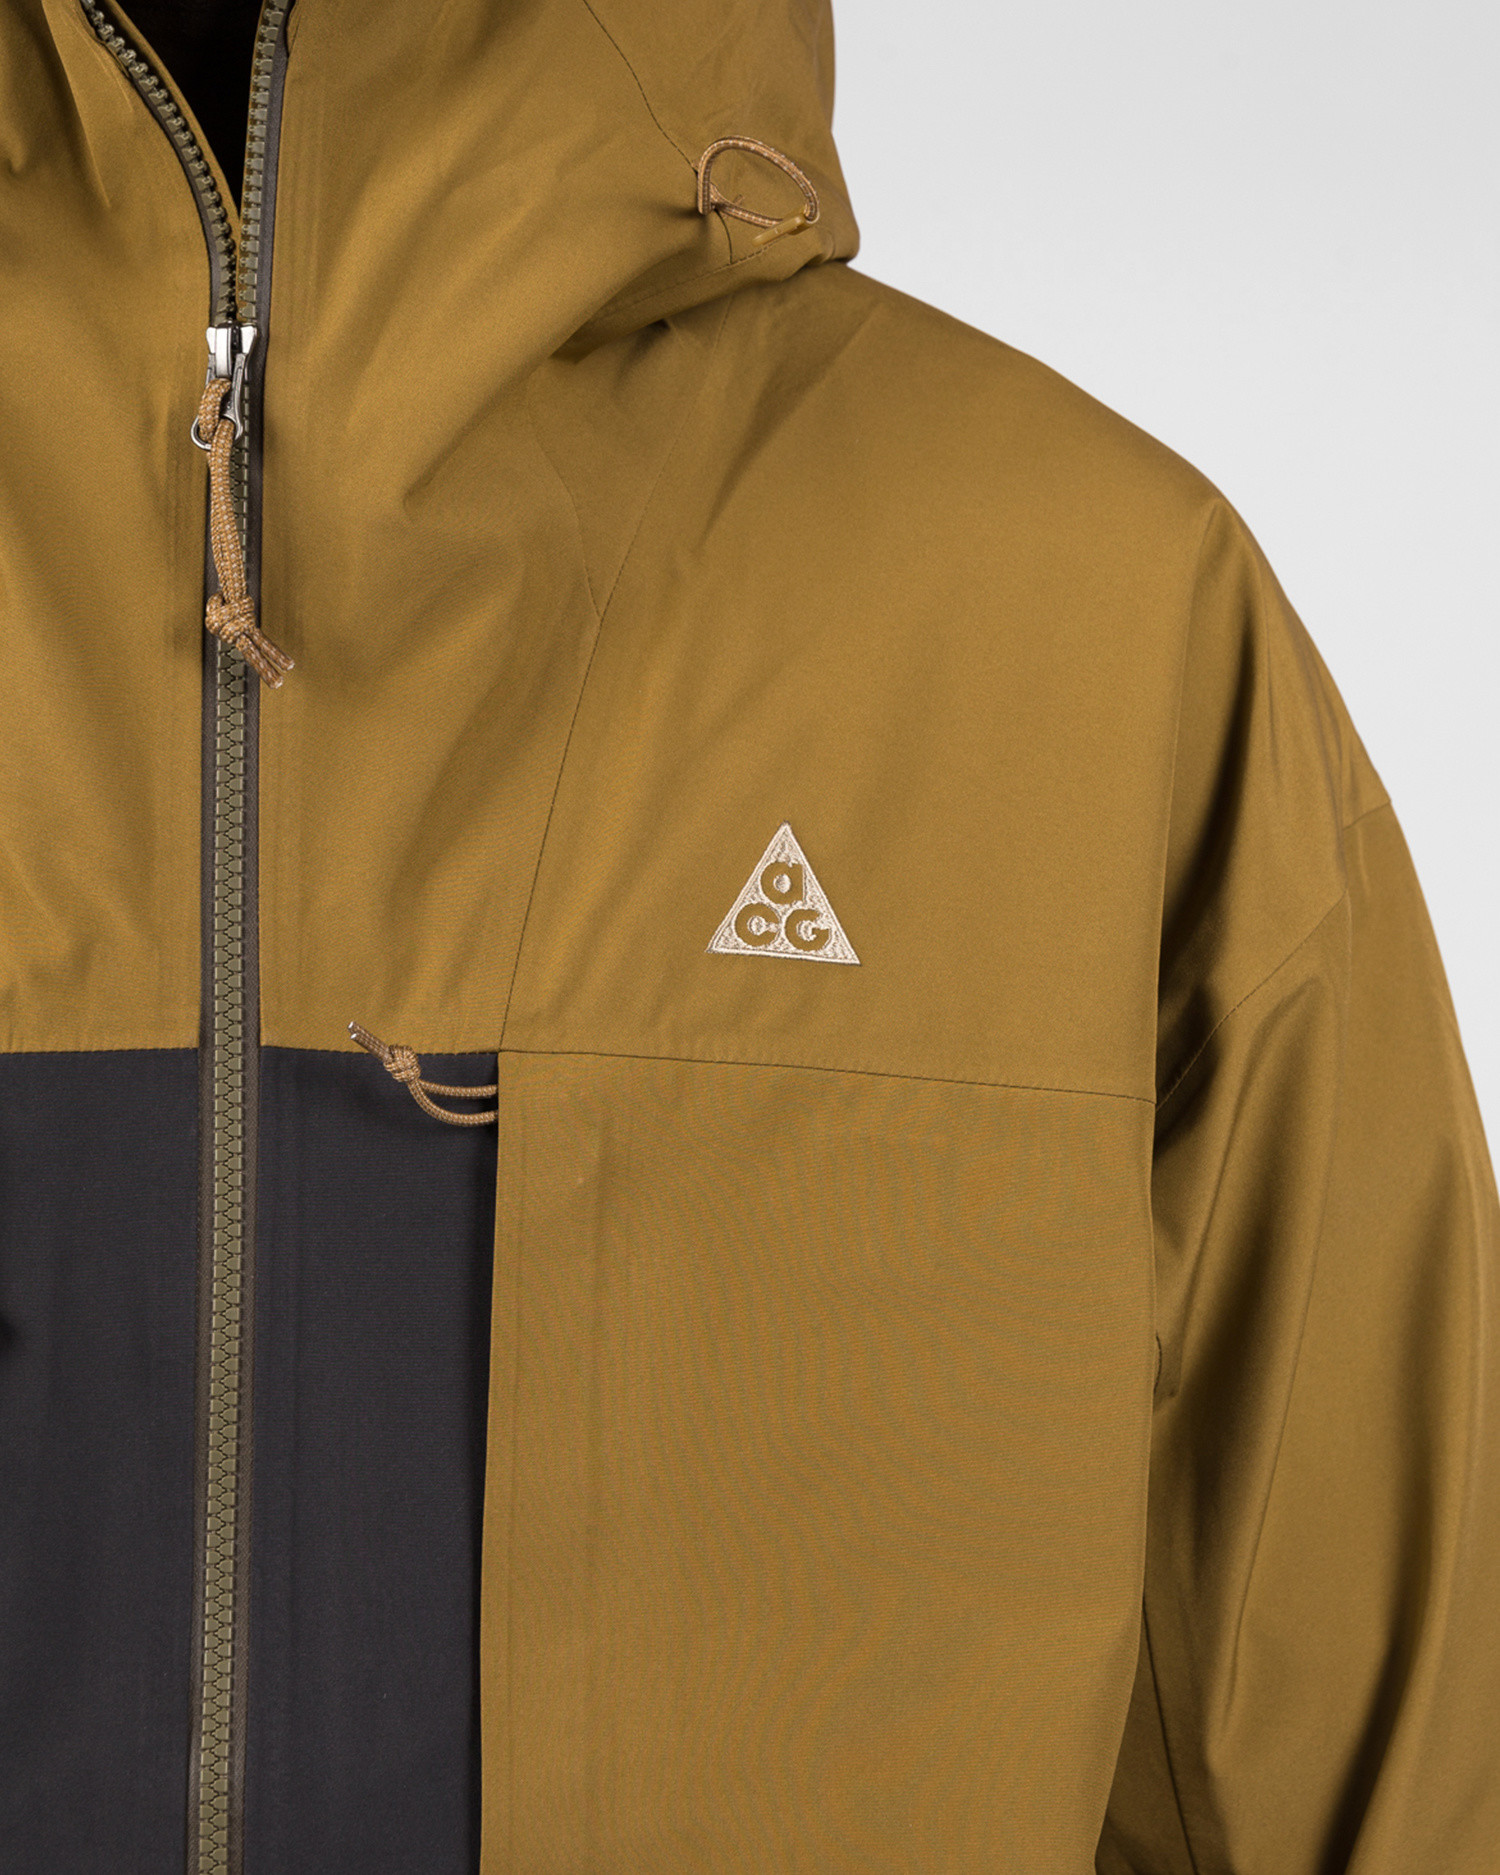 Nike M Nrg Acg Misery Rdge Gore Jacket Golden Beige/Anthracite/Black